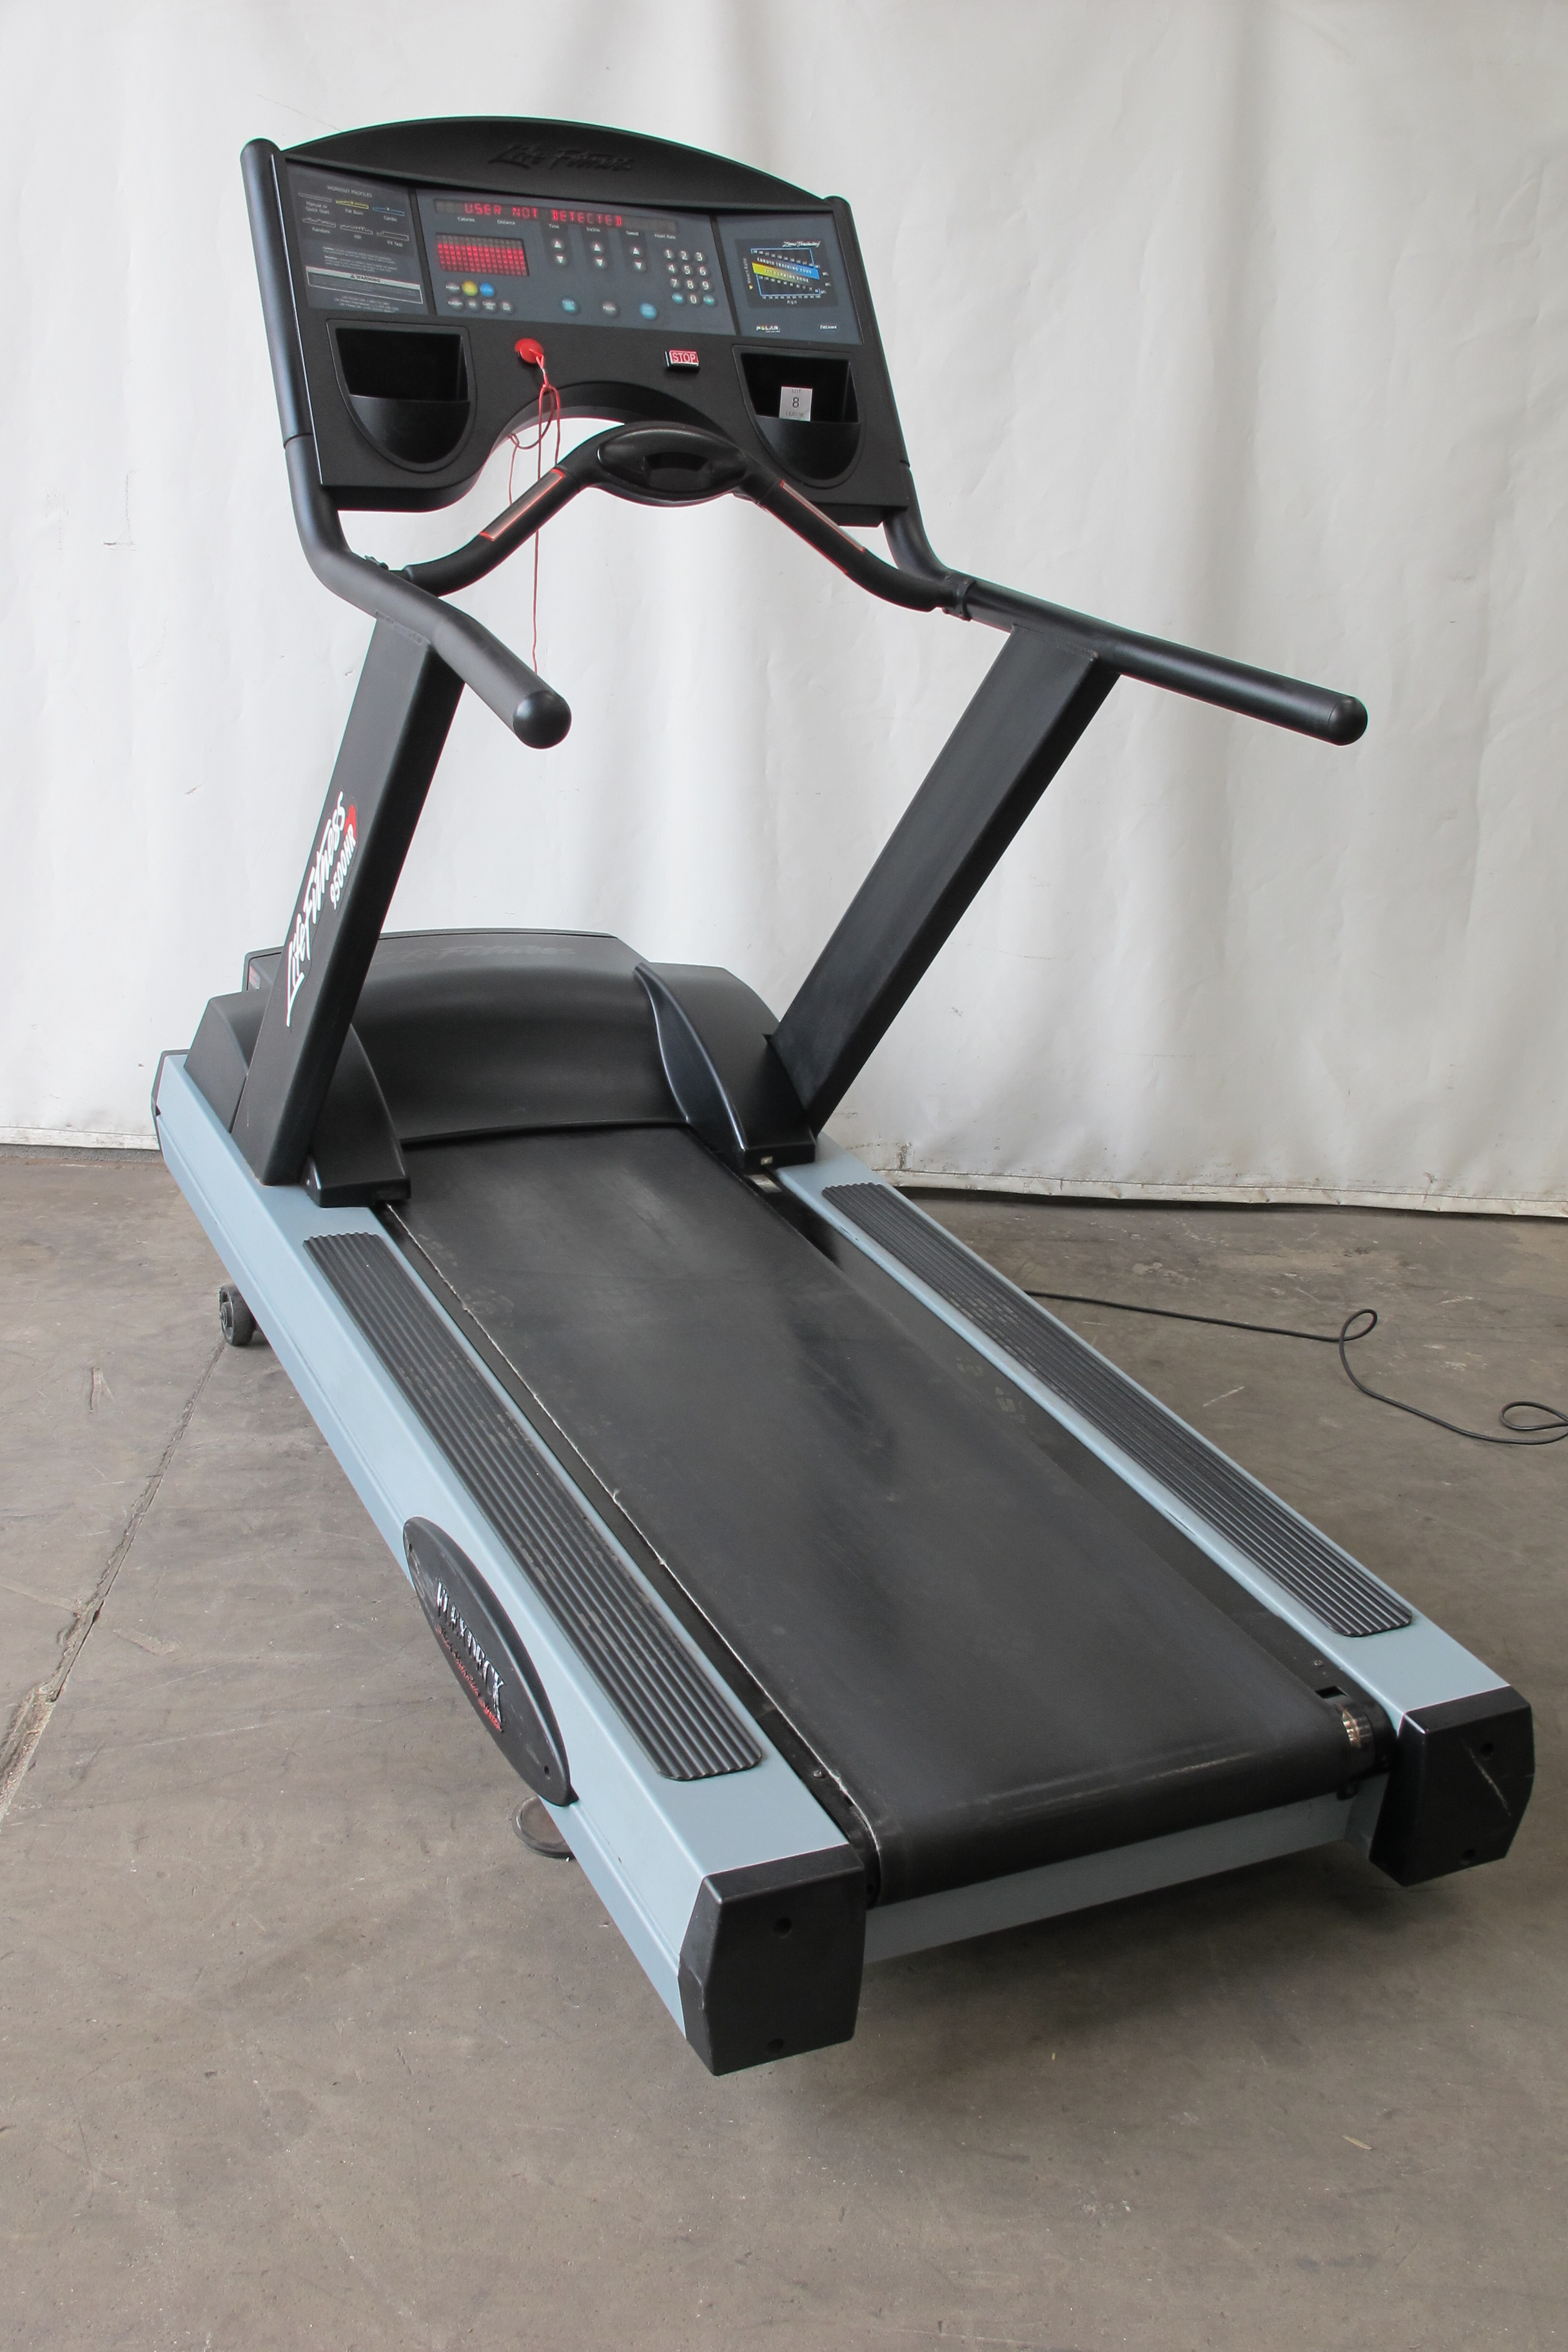 Treadmill Life Fitness 9500hr Photos